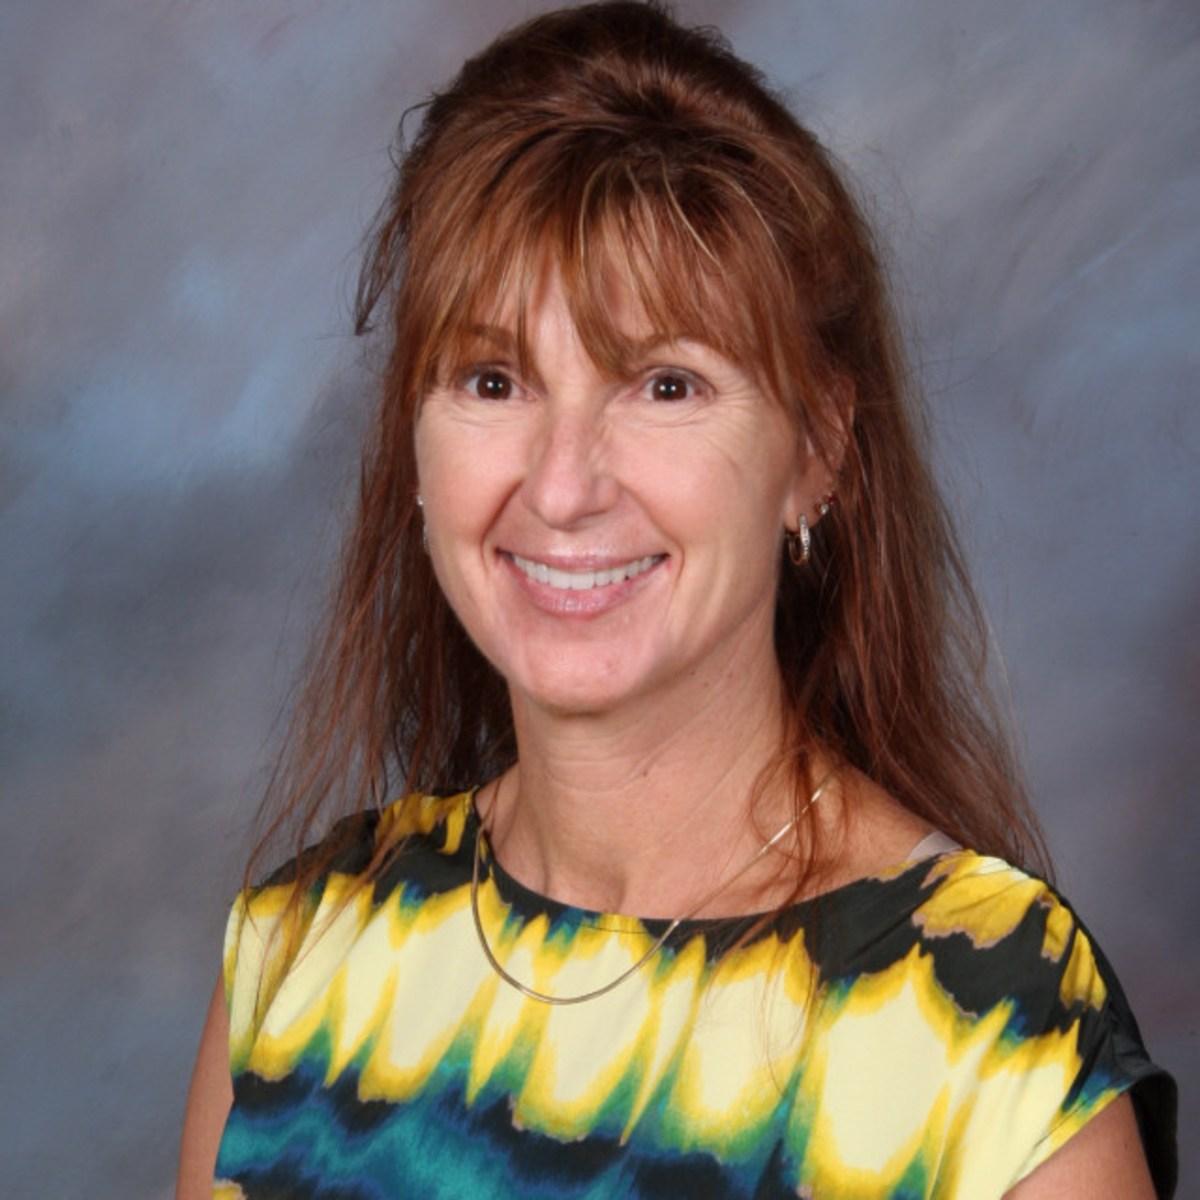 staff directory highland high school marie godde schmidt s profile photo